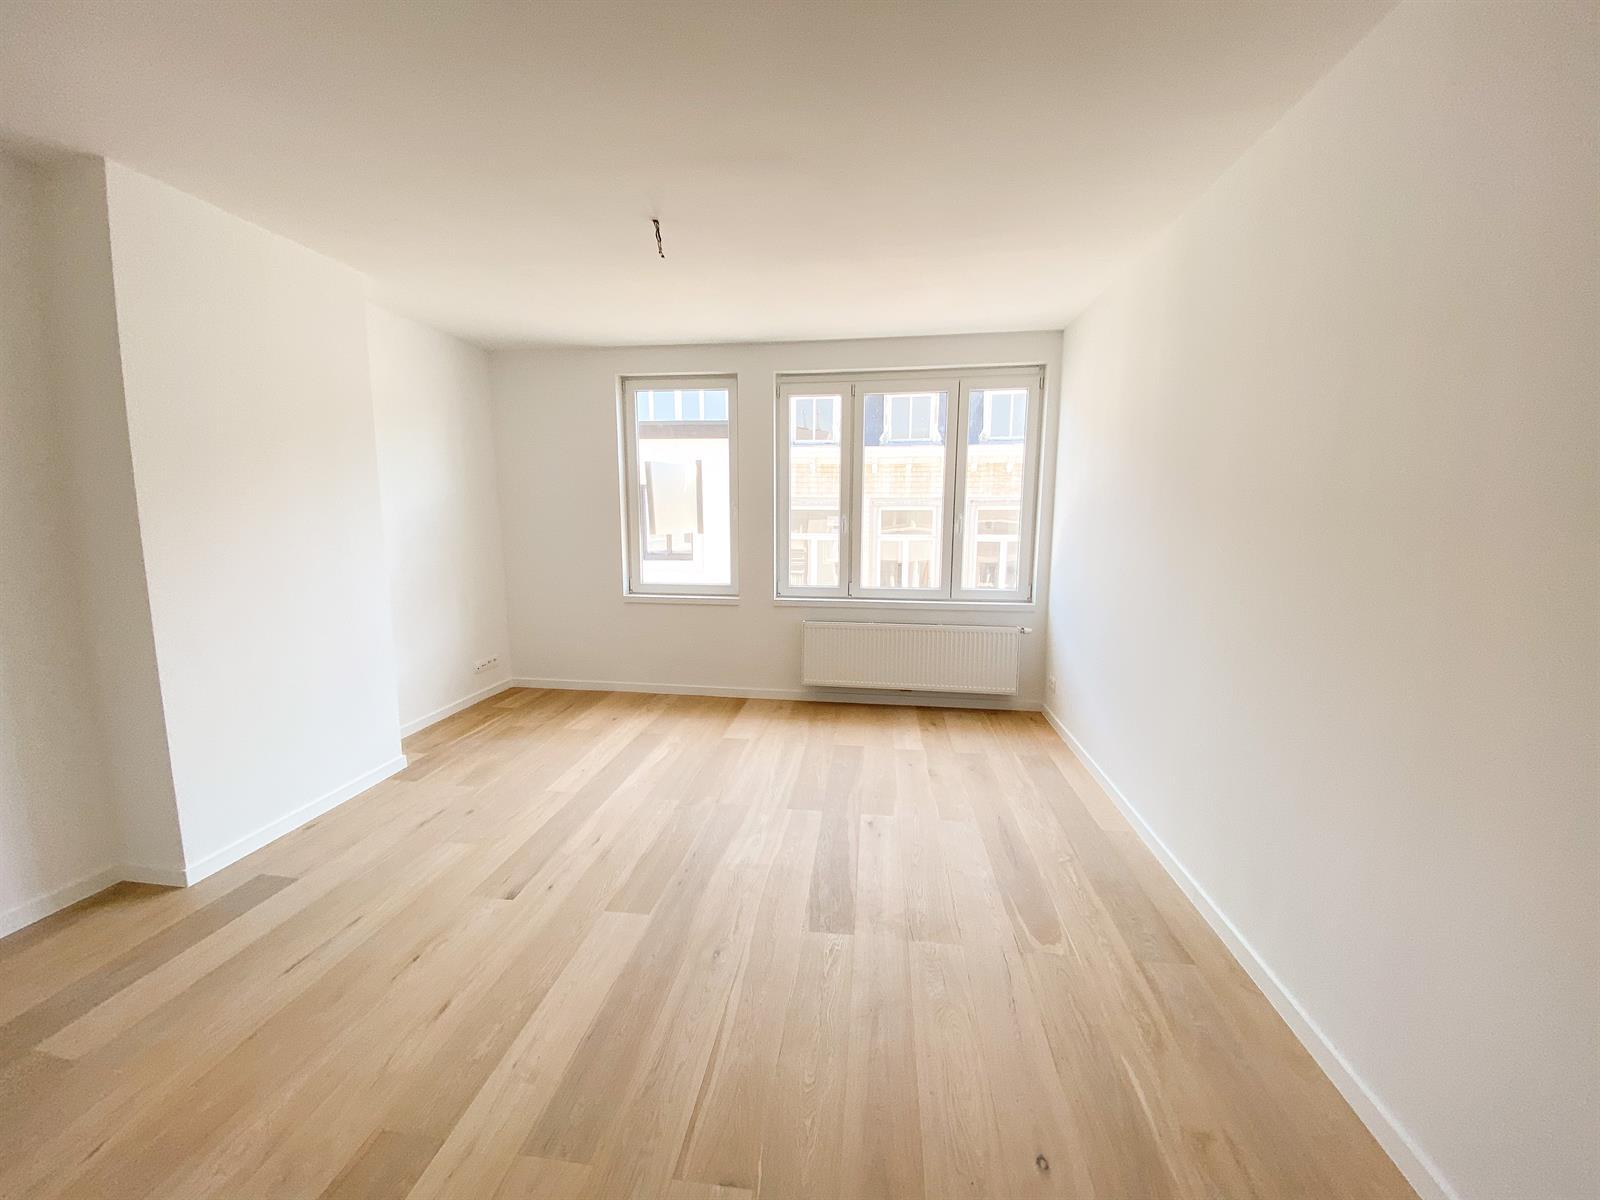 Appartement - Liège - #4045830-5